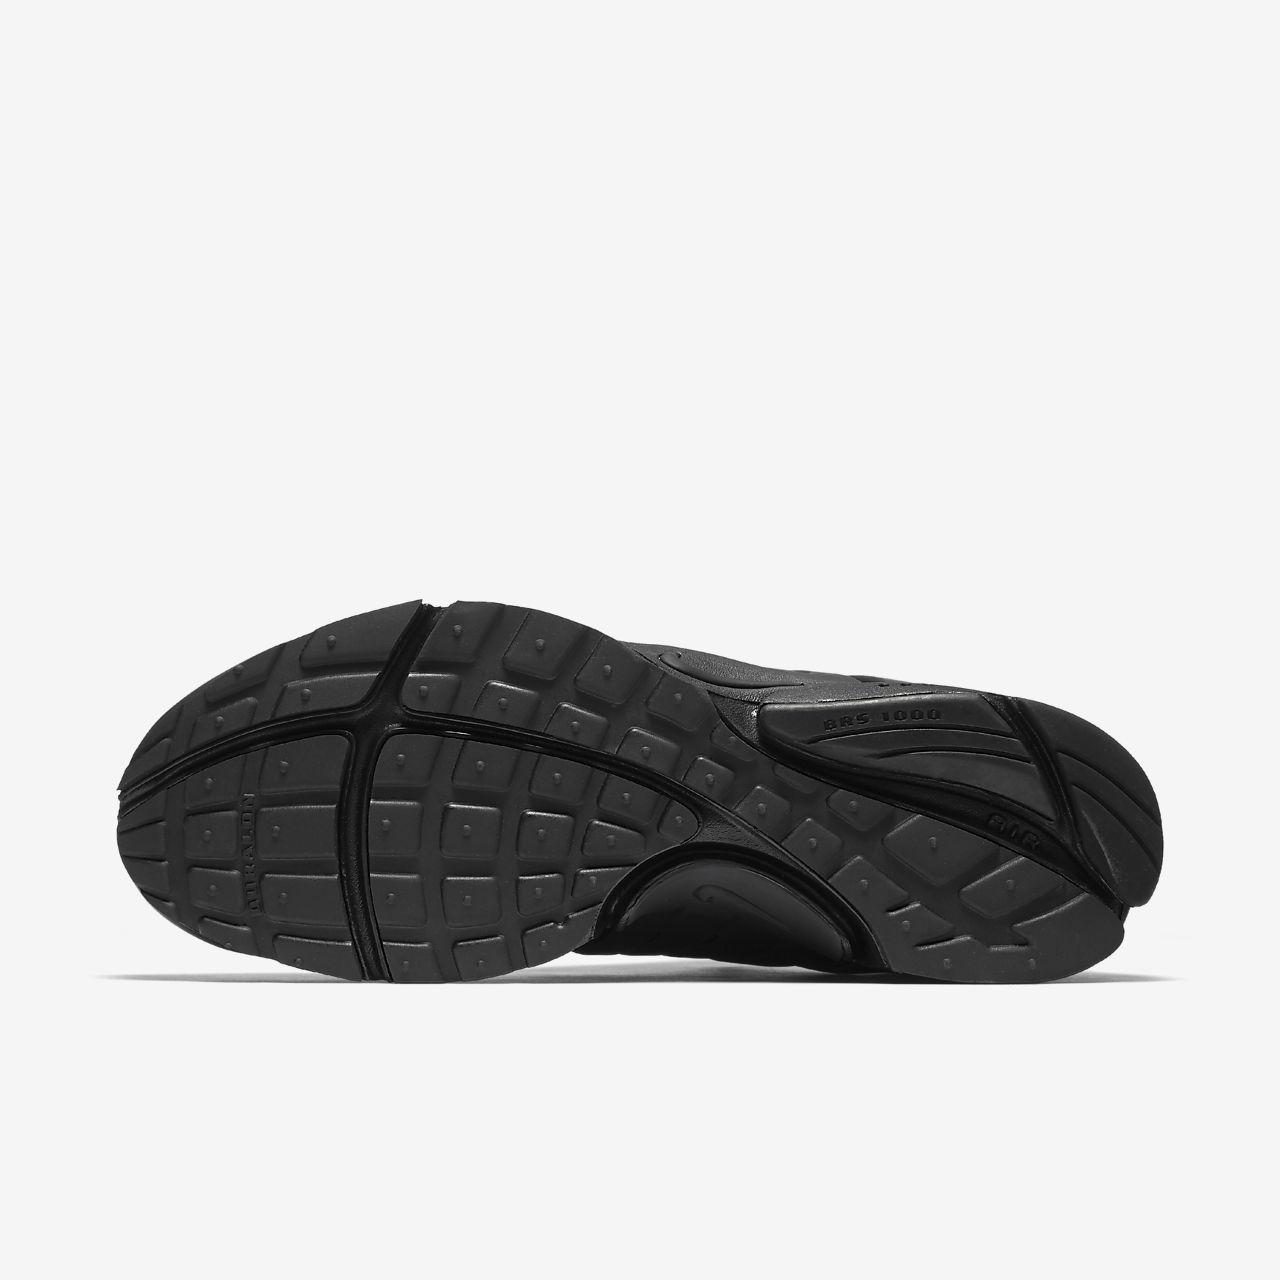 ... Nike Air Presto Essential Mens Shoe